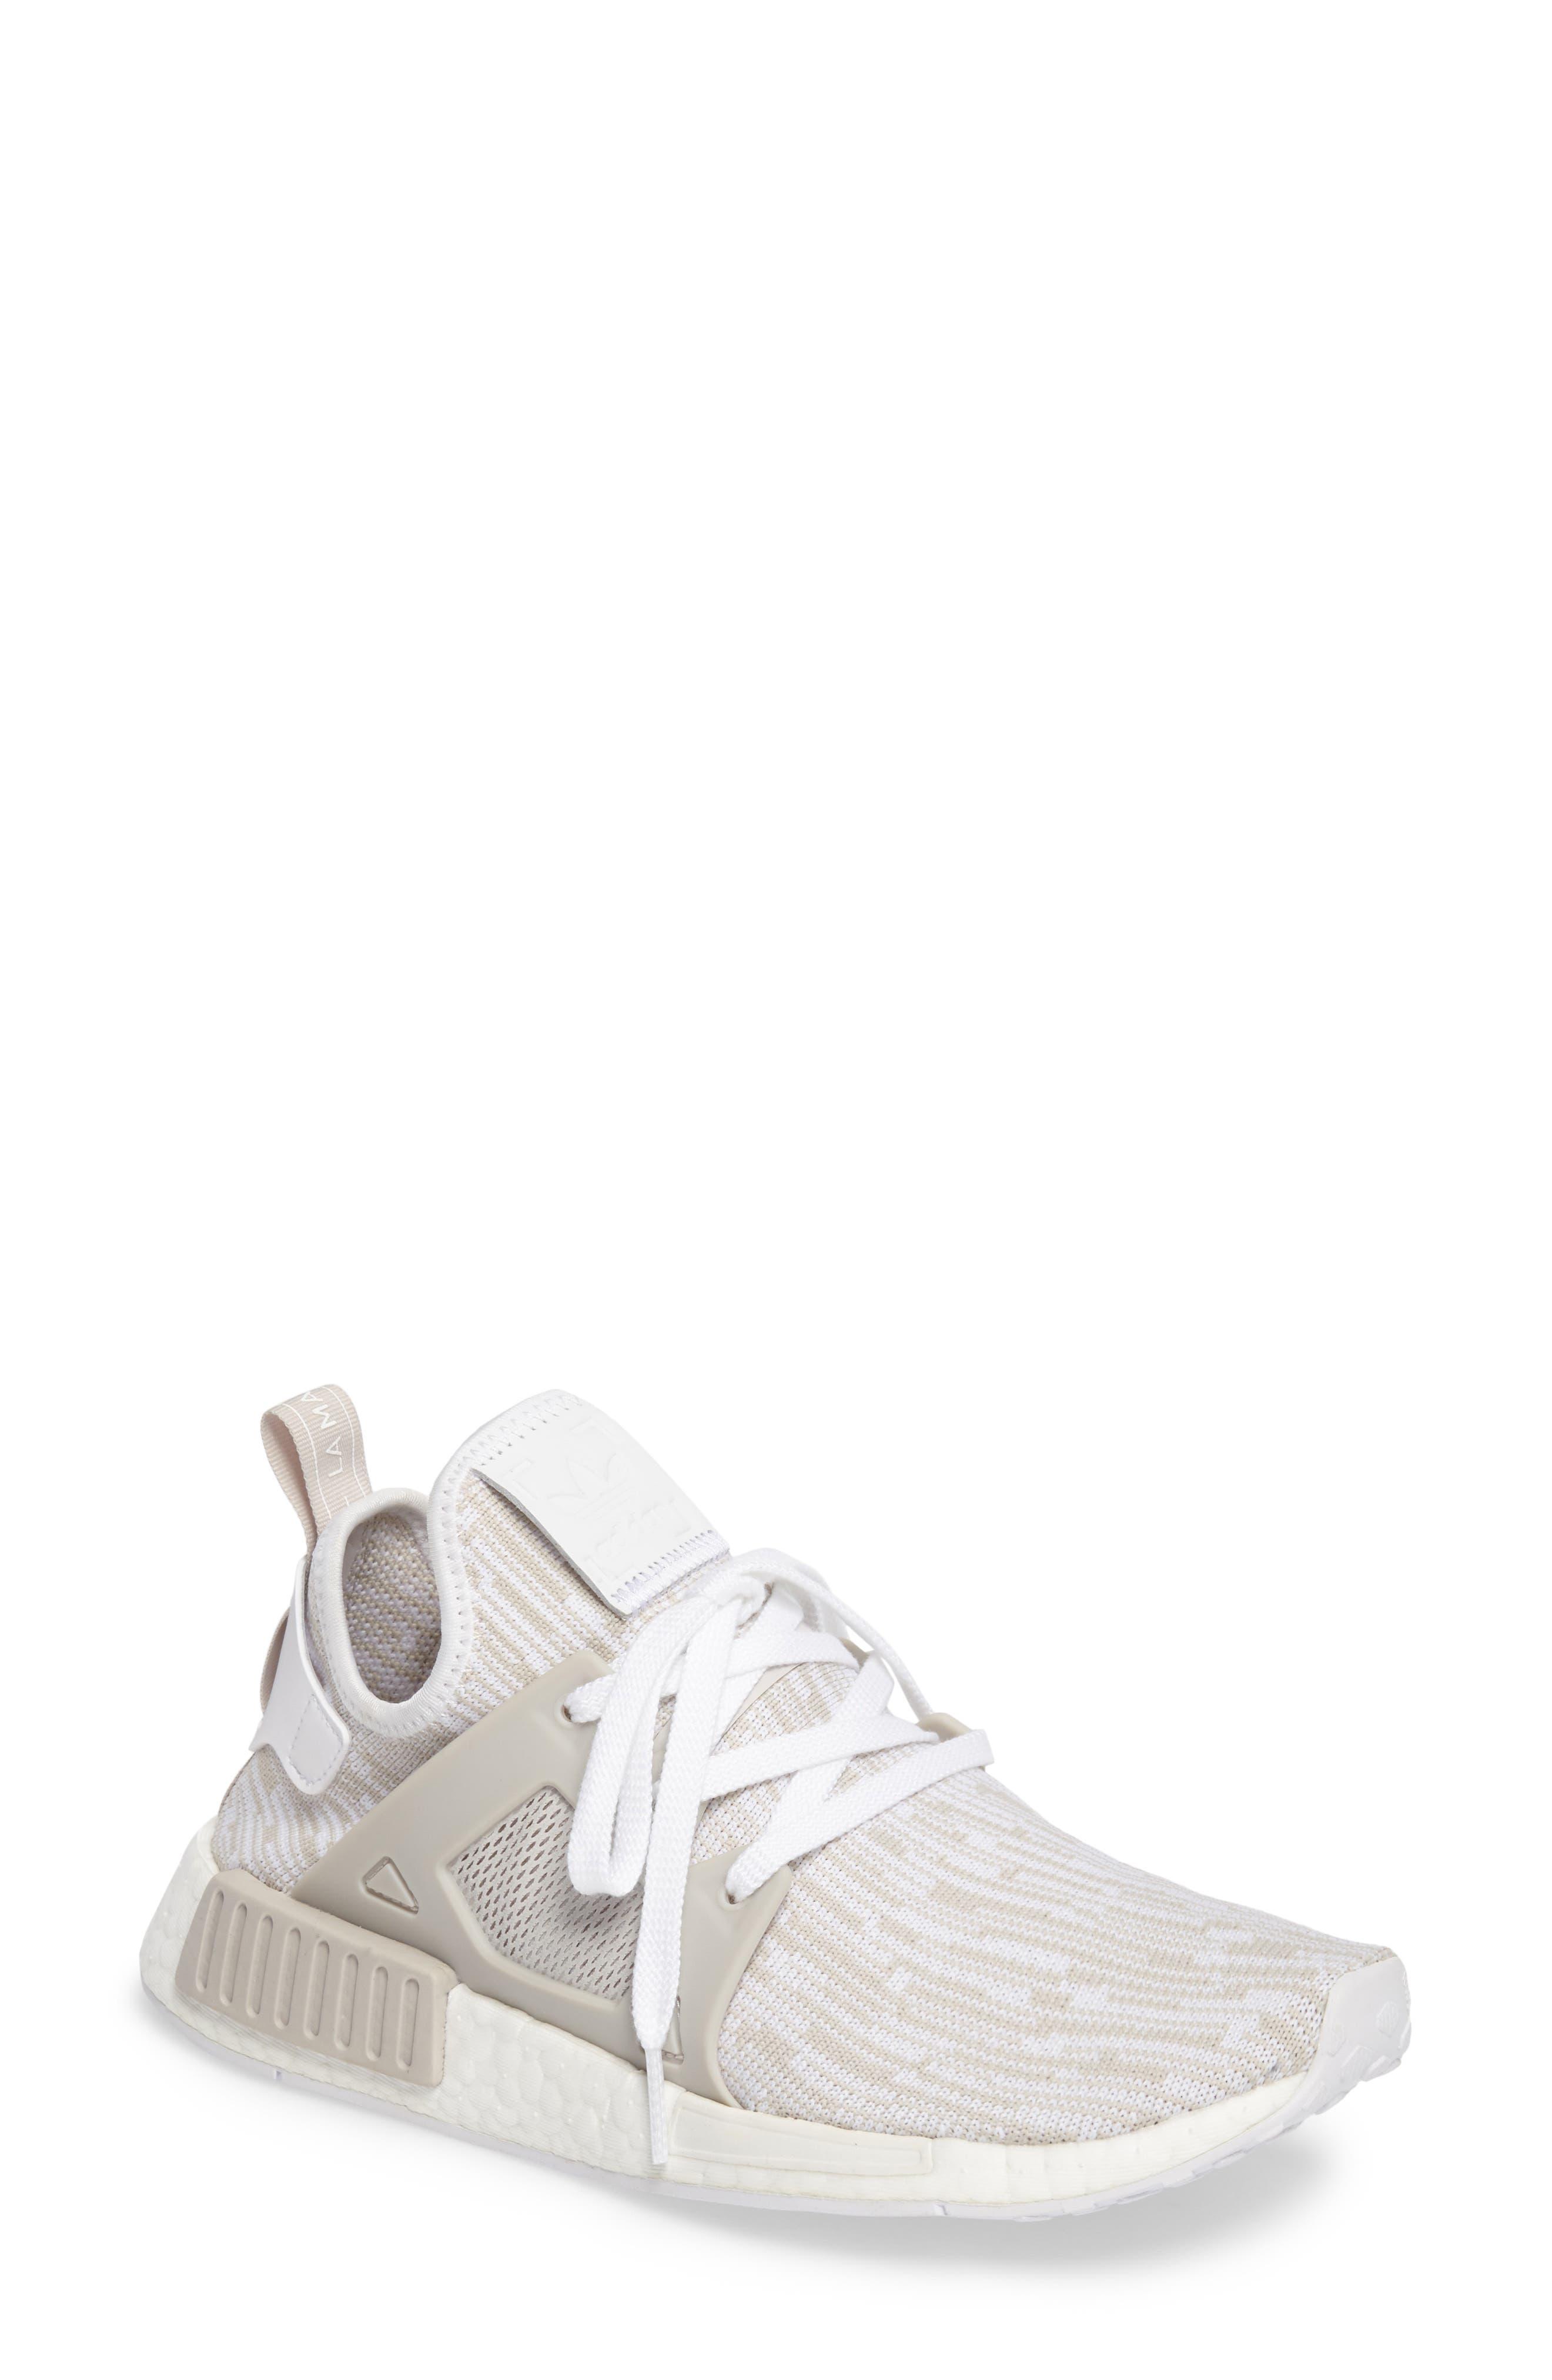 Main Image - adidas NMD XR1 Athletic Shoe (Women)